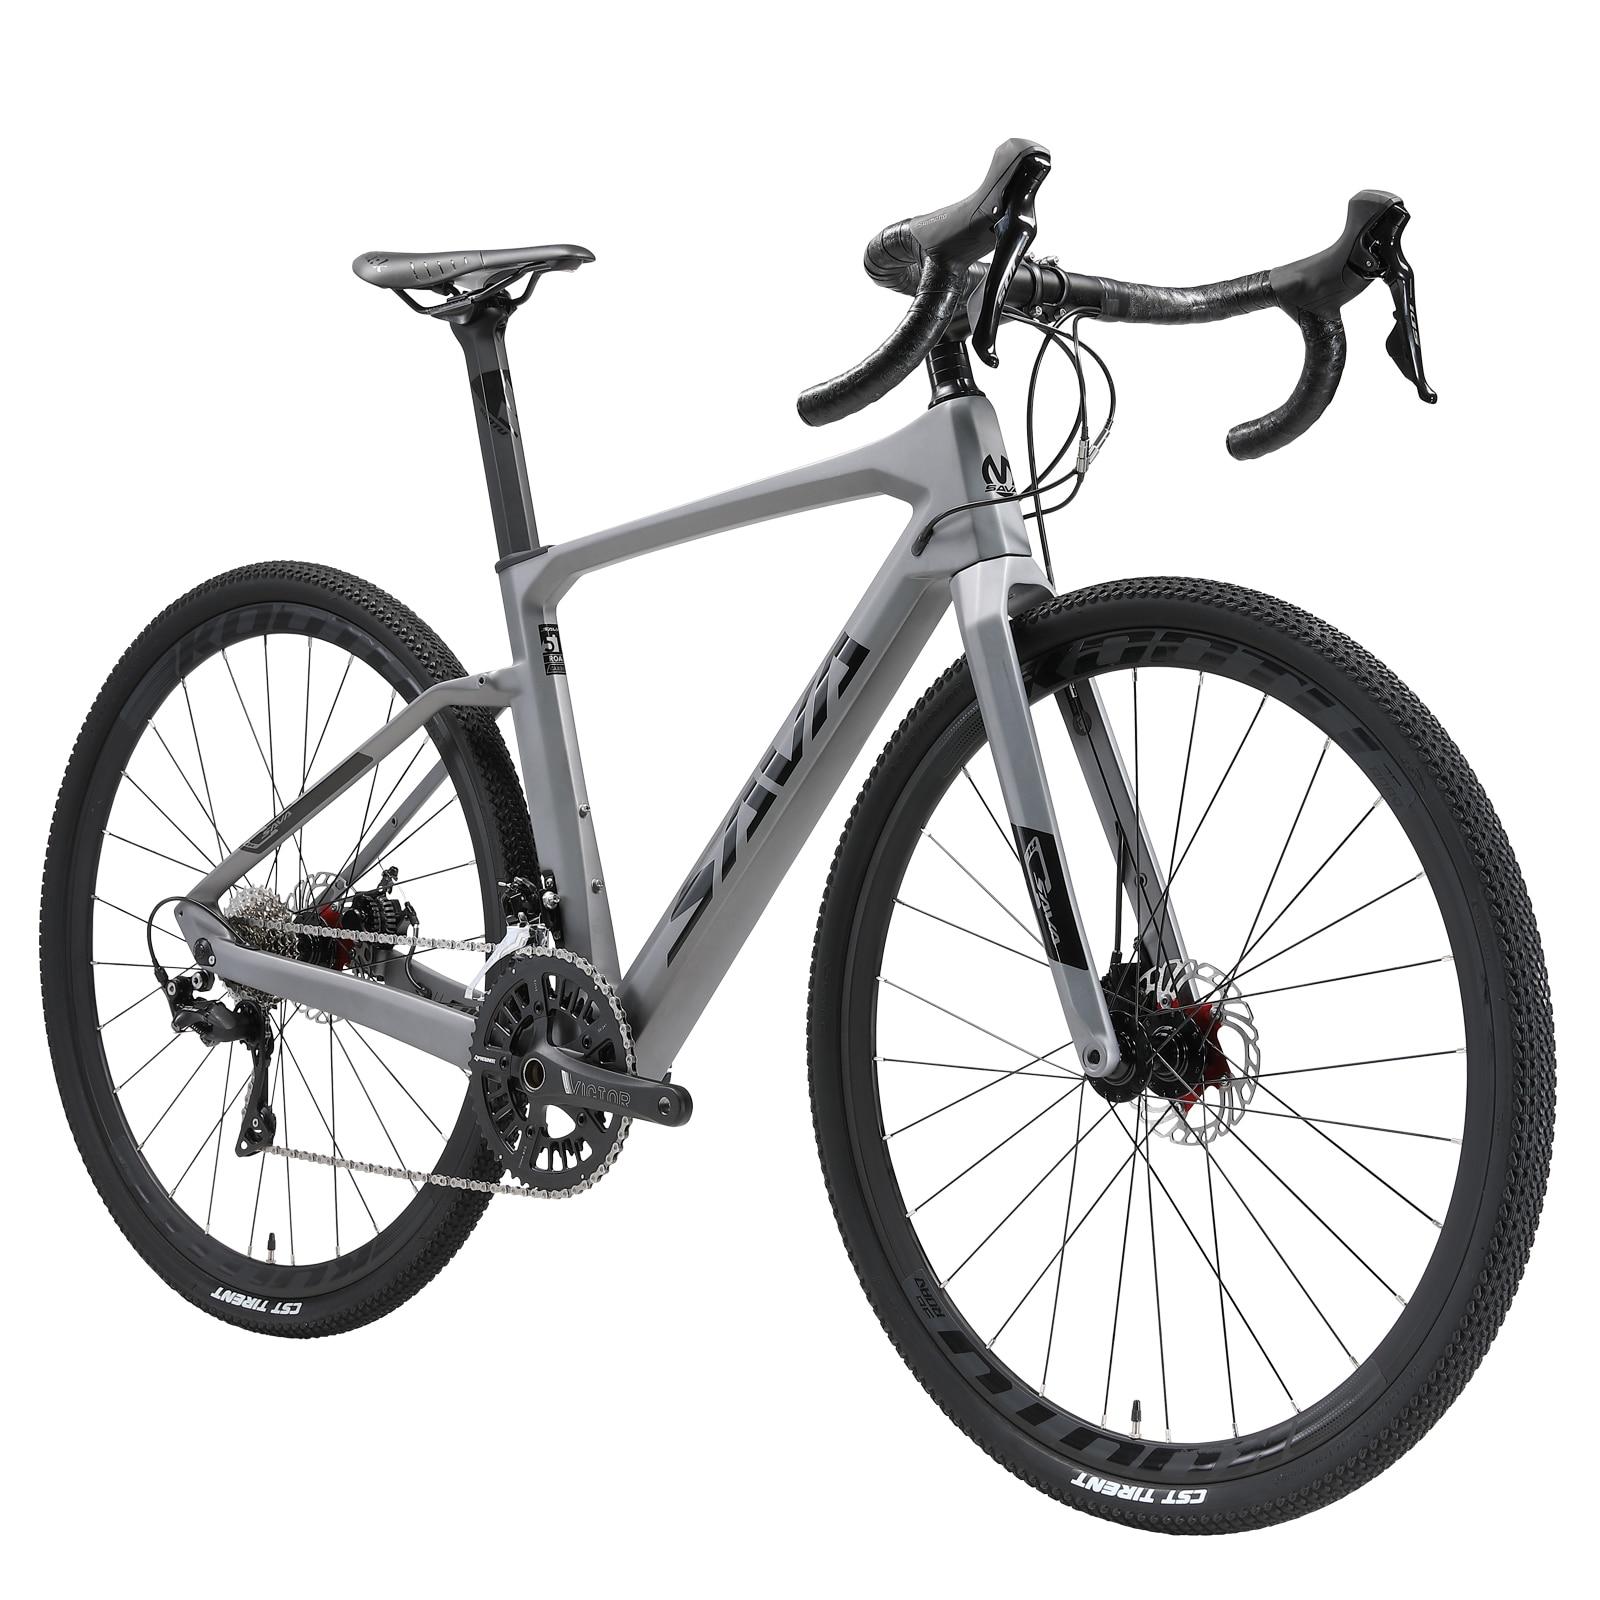 SAVA Carbon Fiber Road Bike Gravel Bike 700x40C R11-R3000 18 Speeds Bicycle with 40c Tires Road Bike Racing Gravel Bike